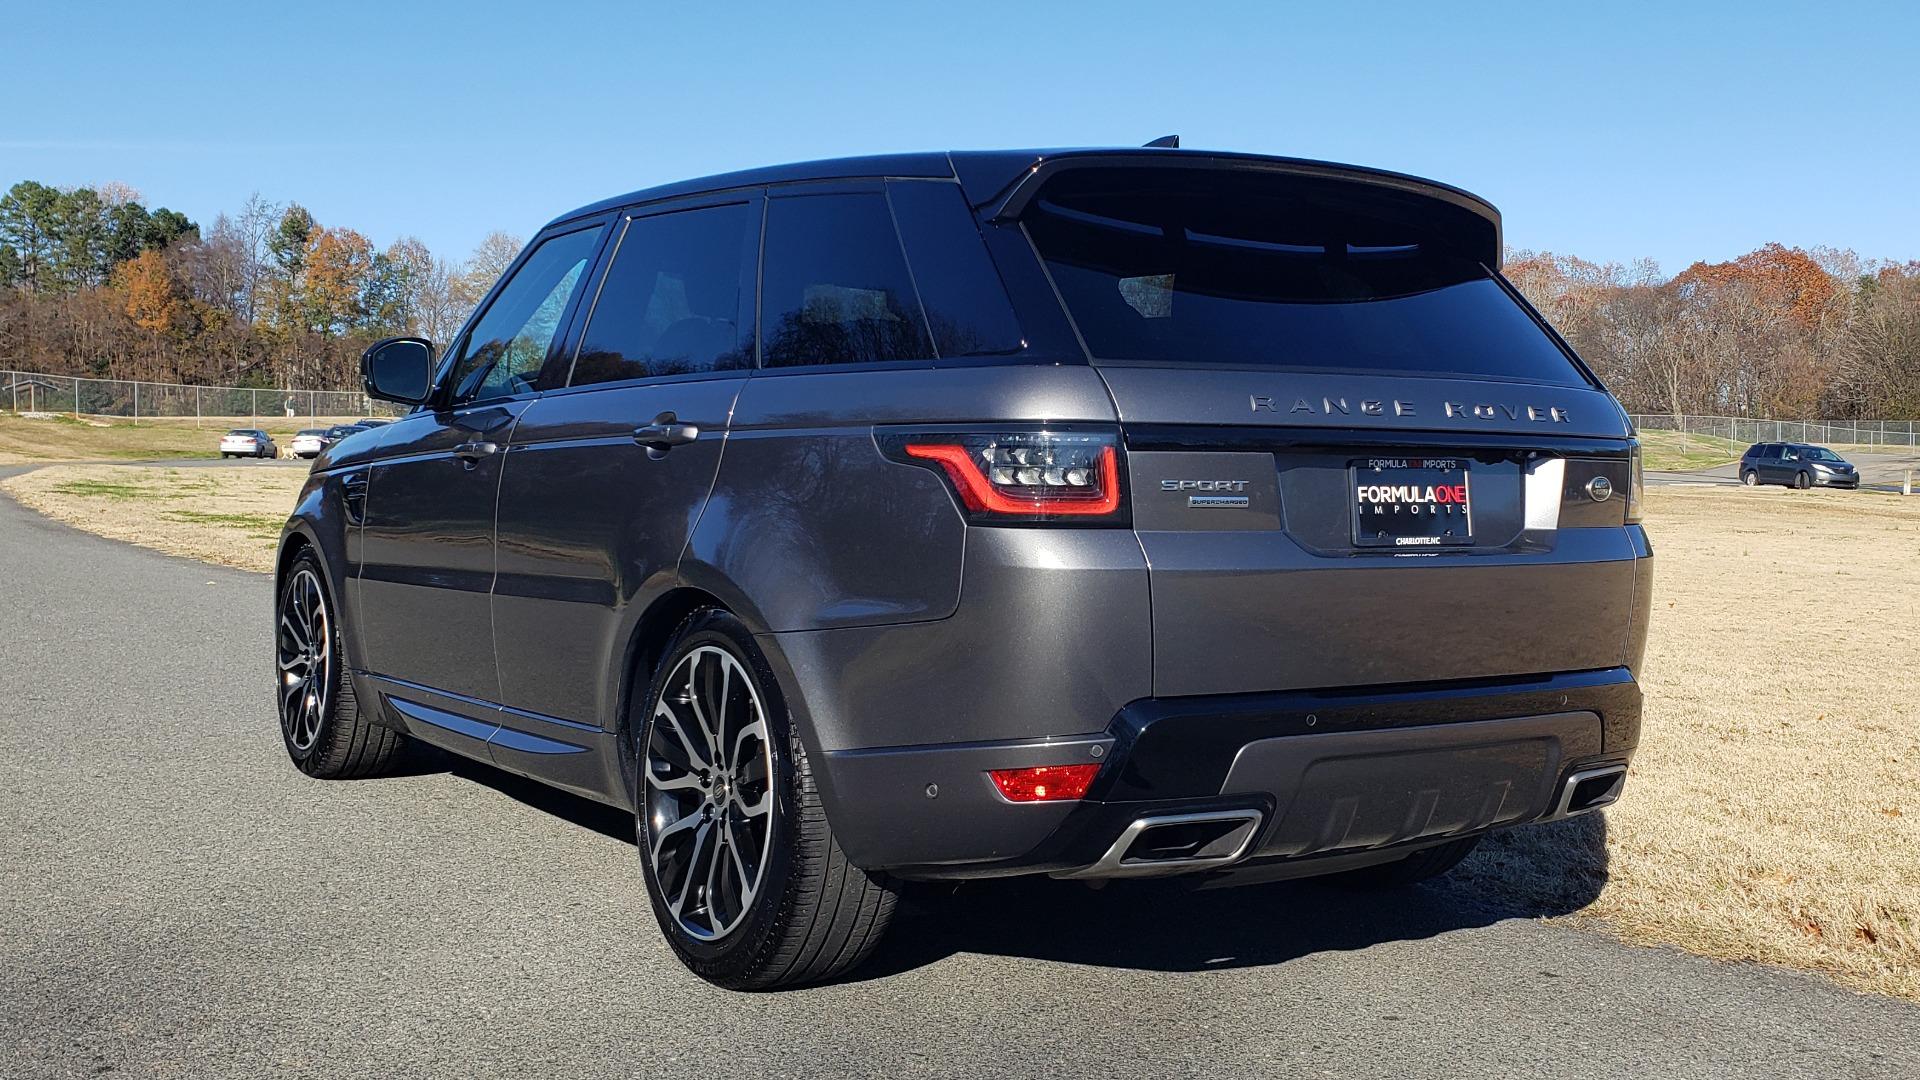 Used 2018 Land Rover RANGE ROVER SPORT DYNAMIC SC V8 / CLIMATE CMFRT / VISION ASST / MERIDIAN for sale Sold at Formula Imports in Charlotte NC 28227 9